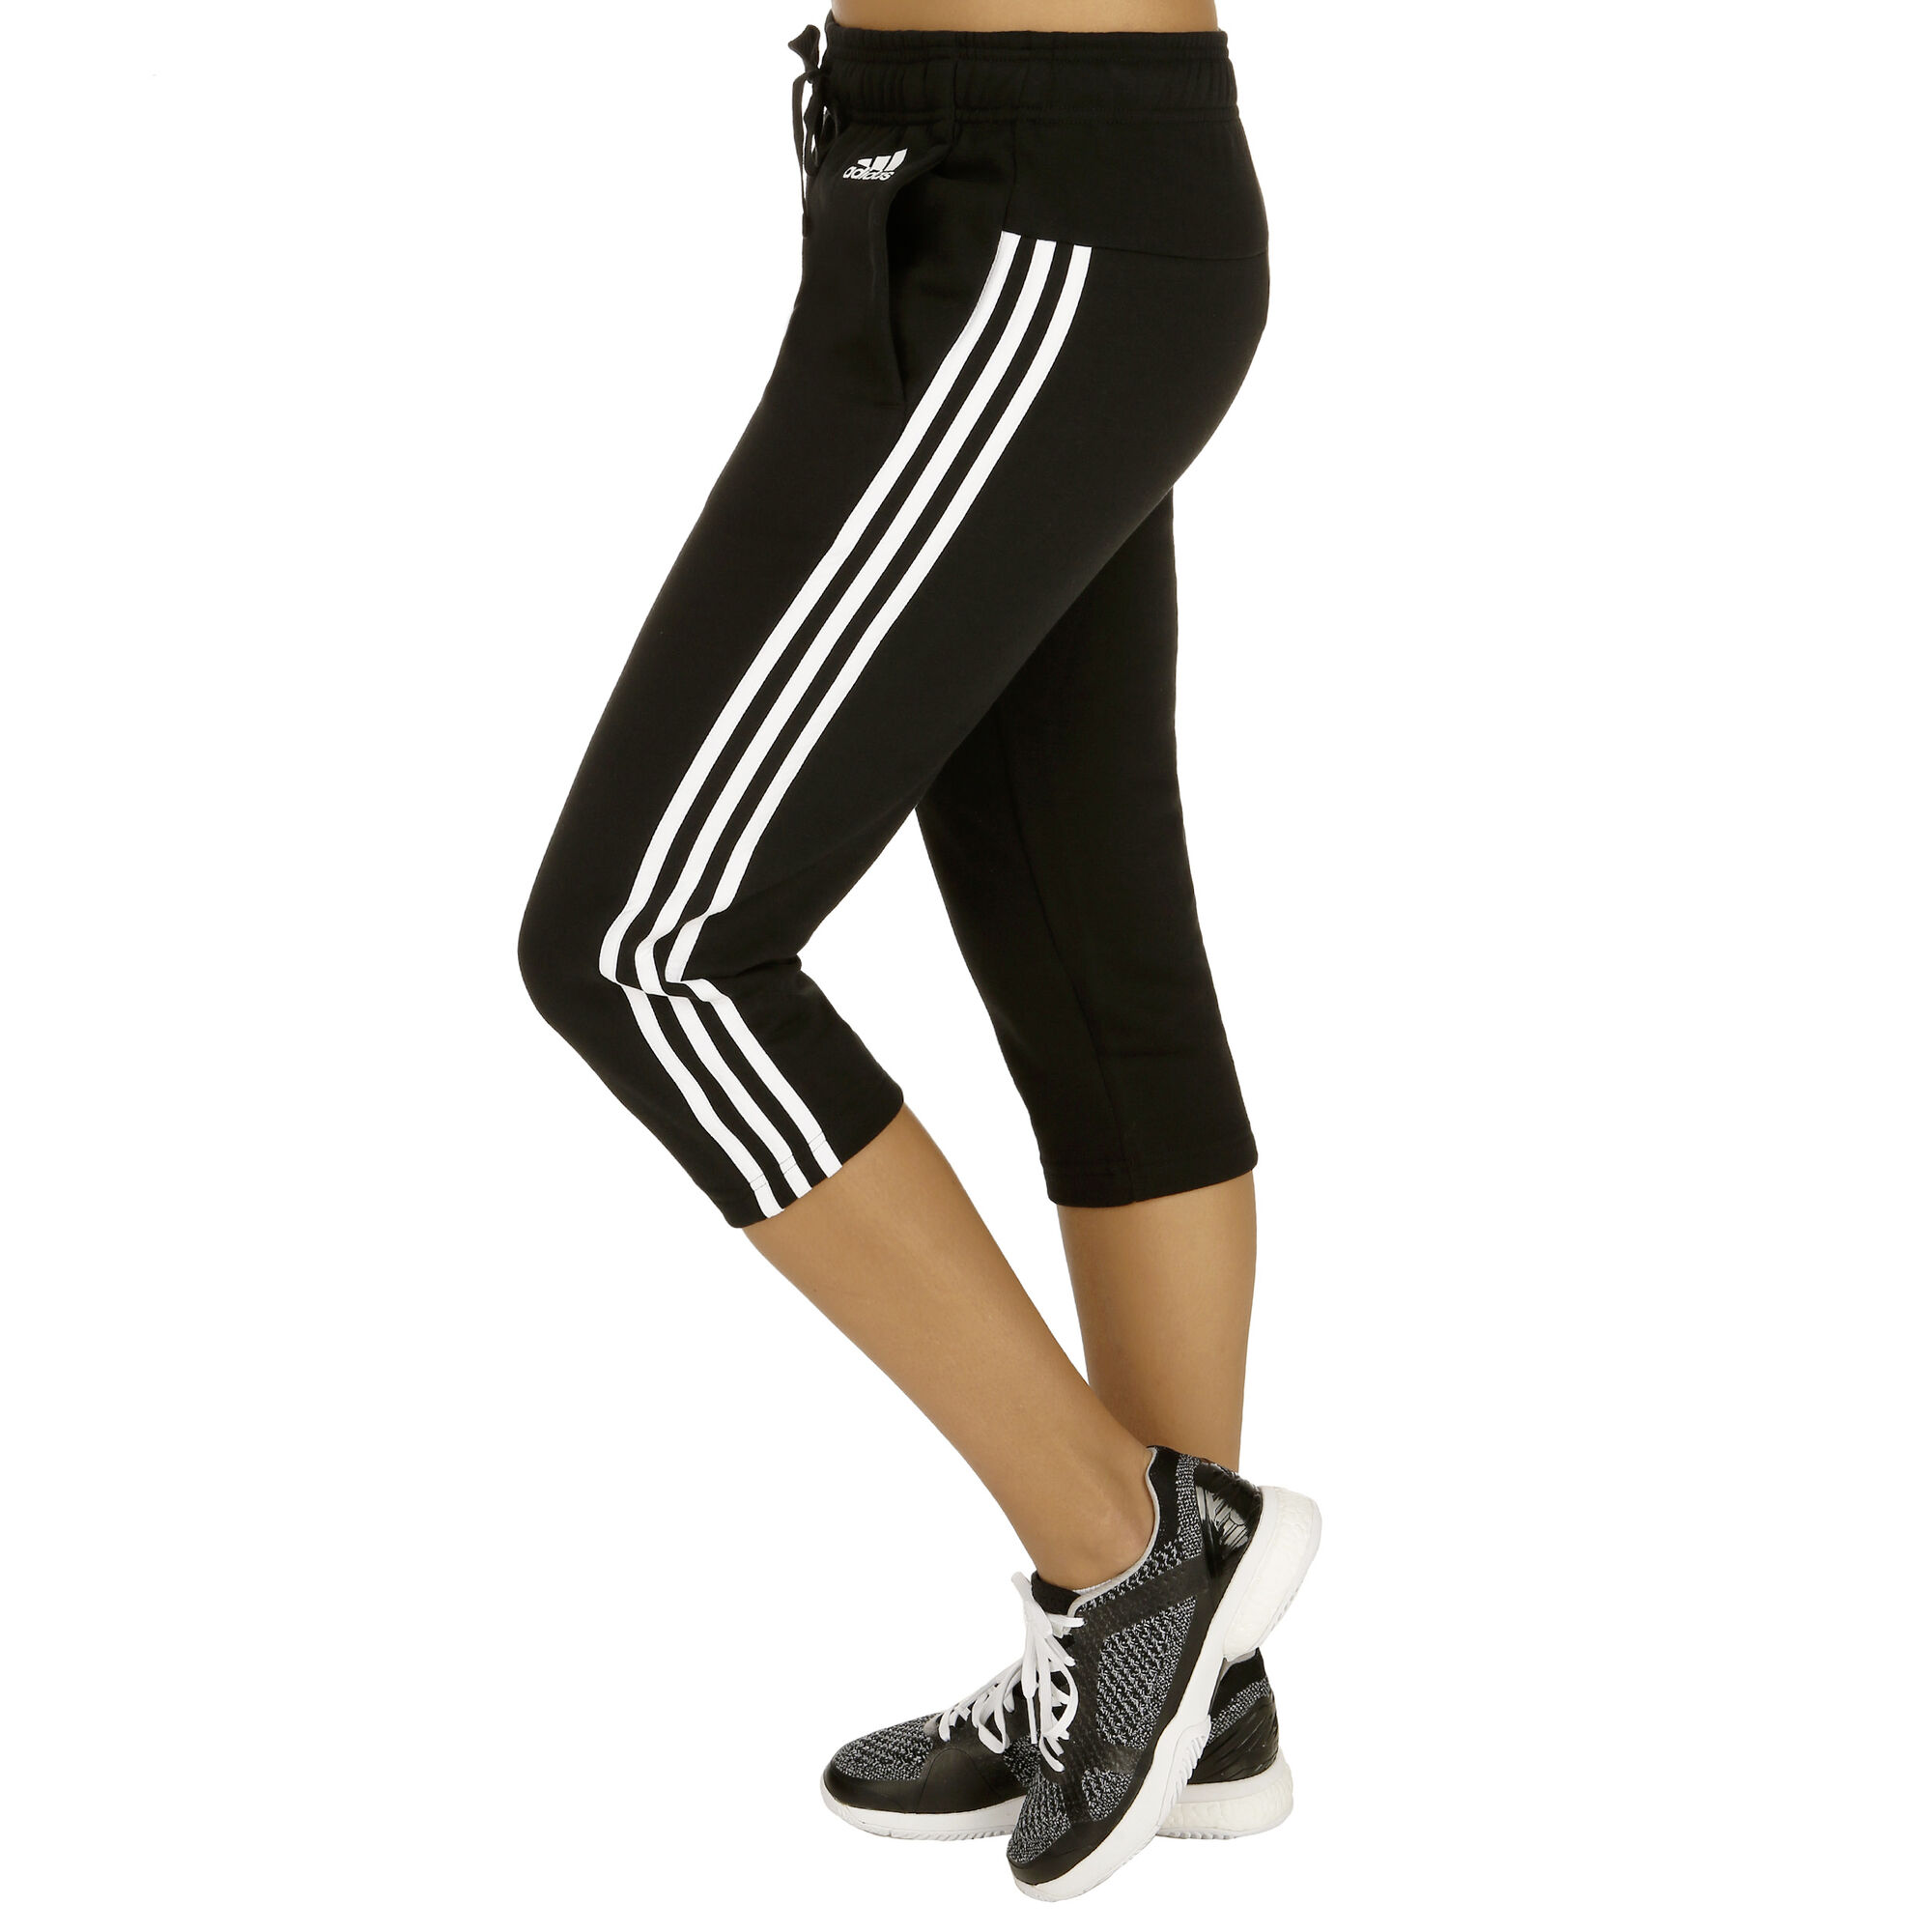 bb372460aa64b5 adidas · adidas · adidas · adidas · adidas · adidas · adidas · adidas ·  adidas · adidas. Essentials 3 Stripes 3 4 ...